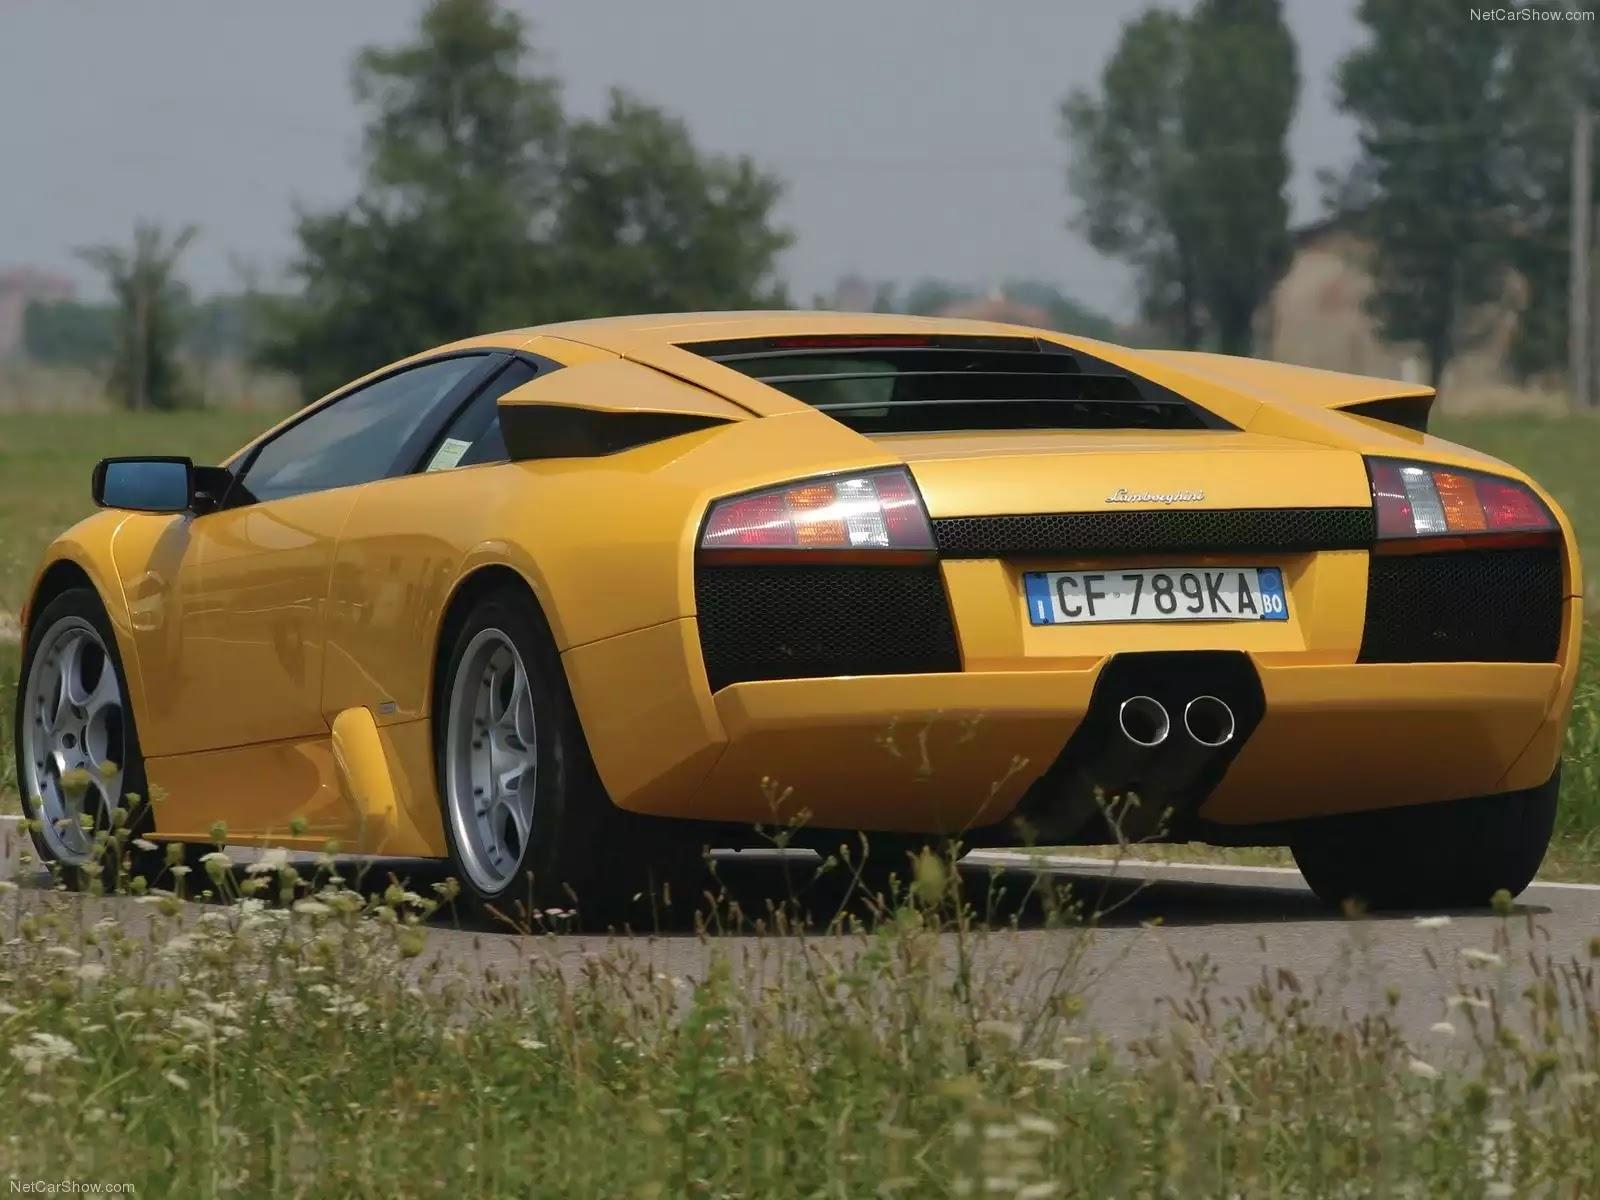 Hình ảnh siêu xe Lamborghini Murcielago 2002 & nội ngoại thất